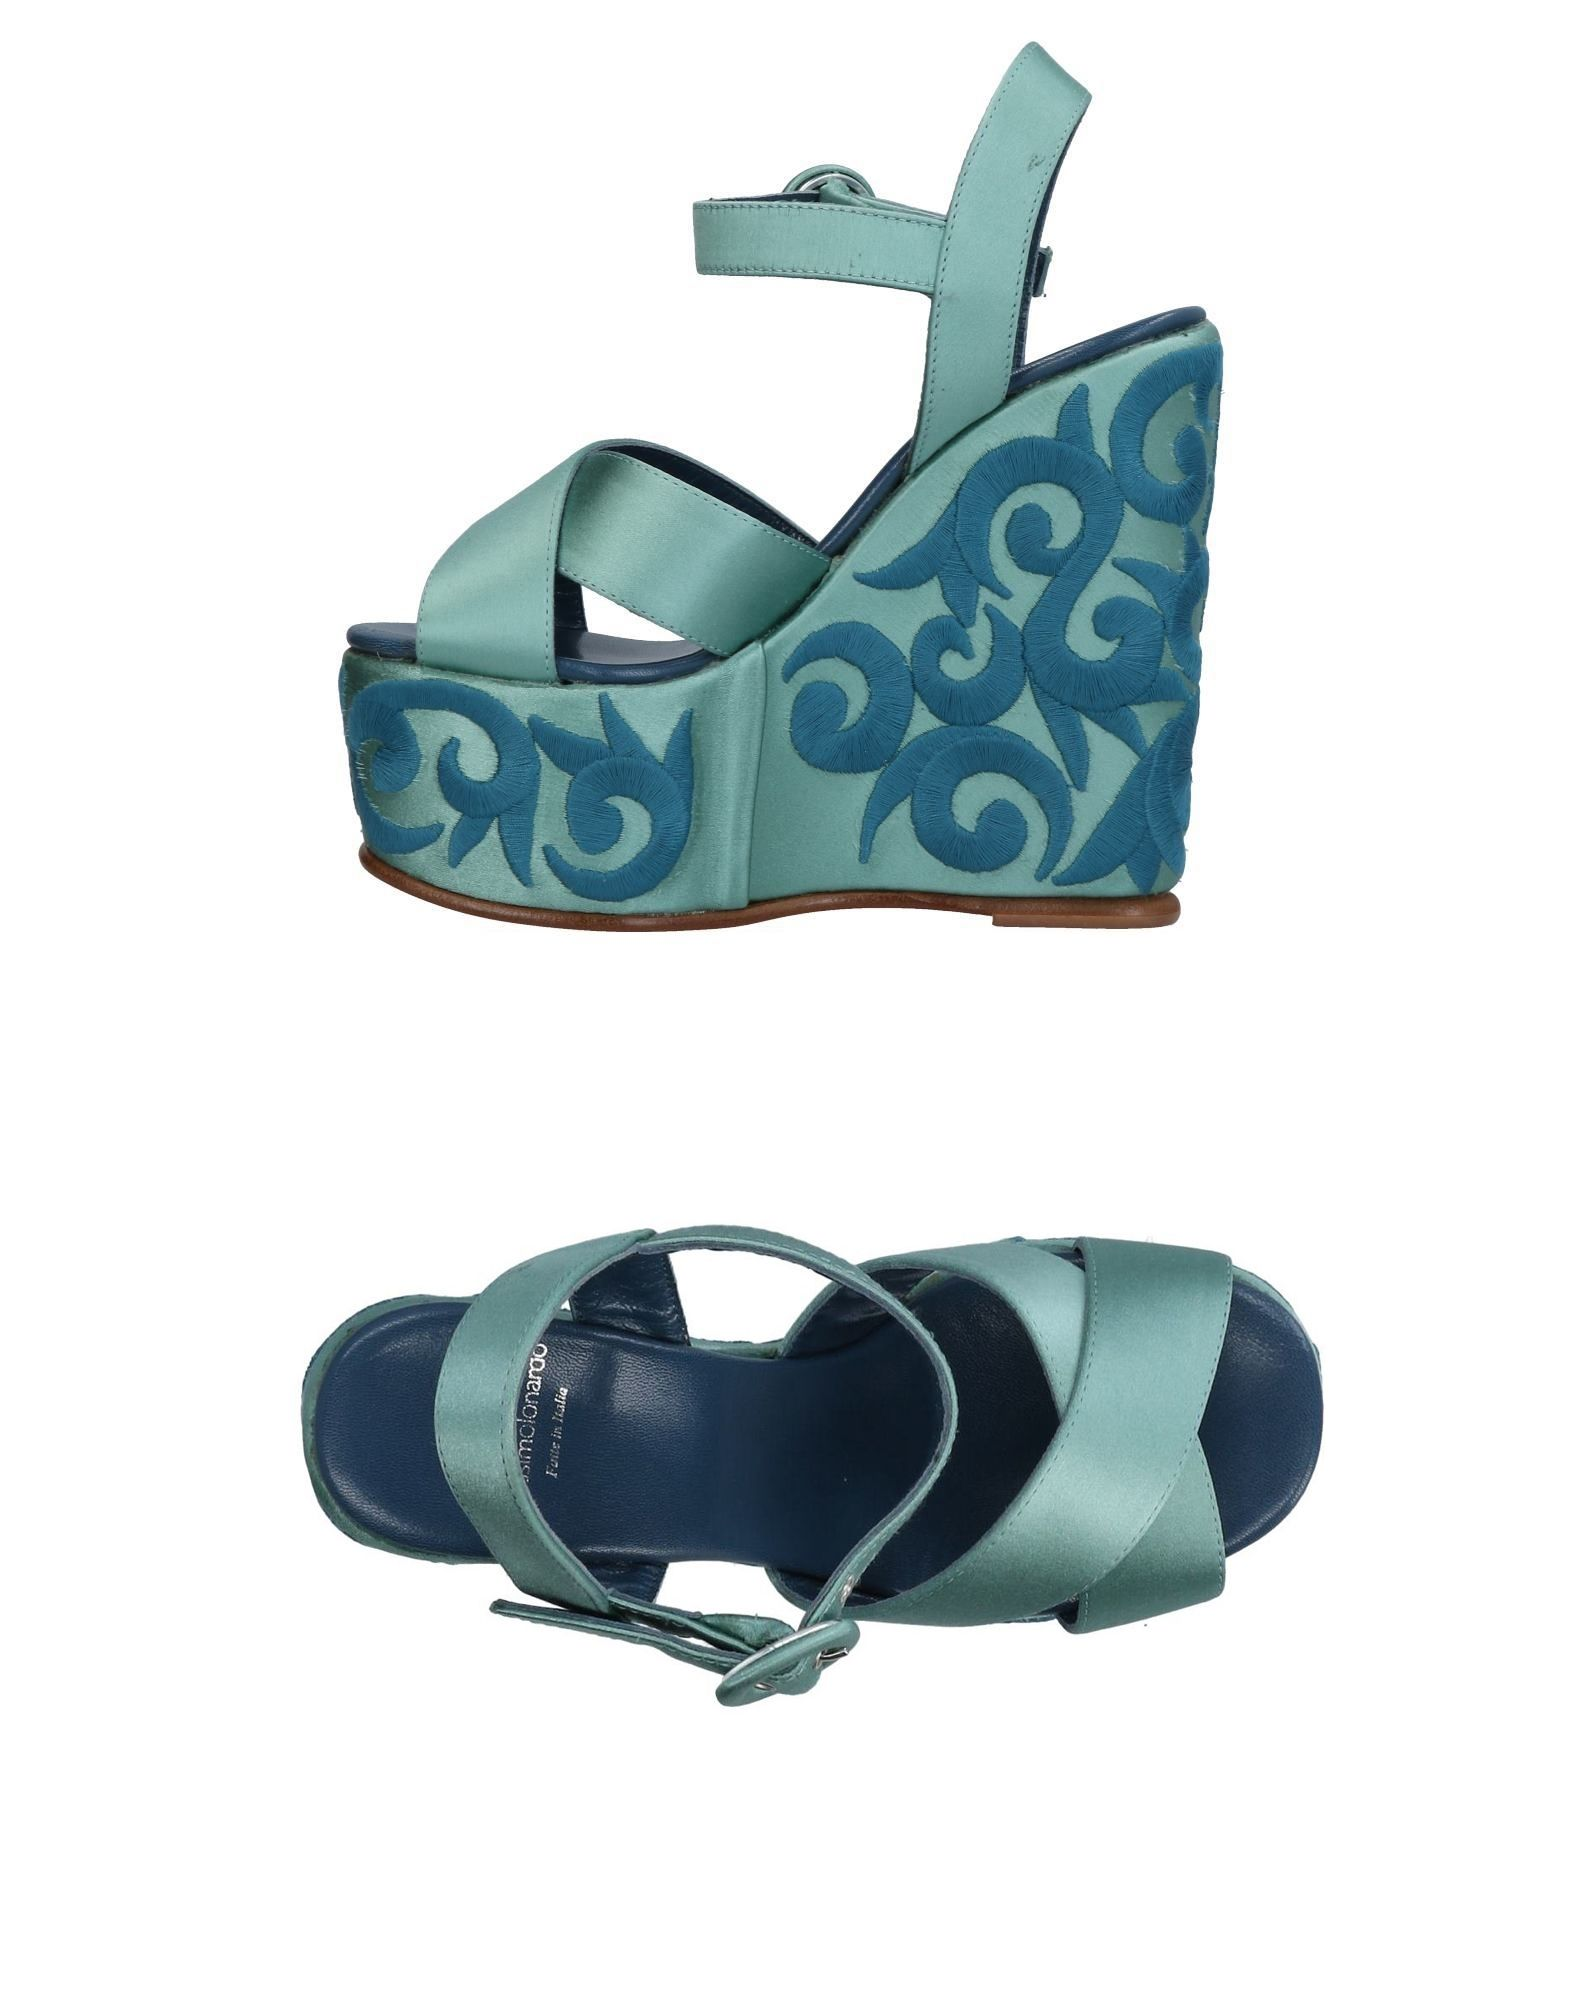 MASSIMO LONARDO Sandals in Sky Blue